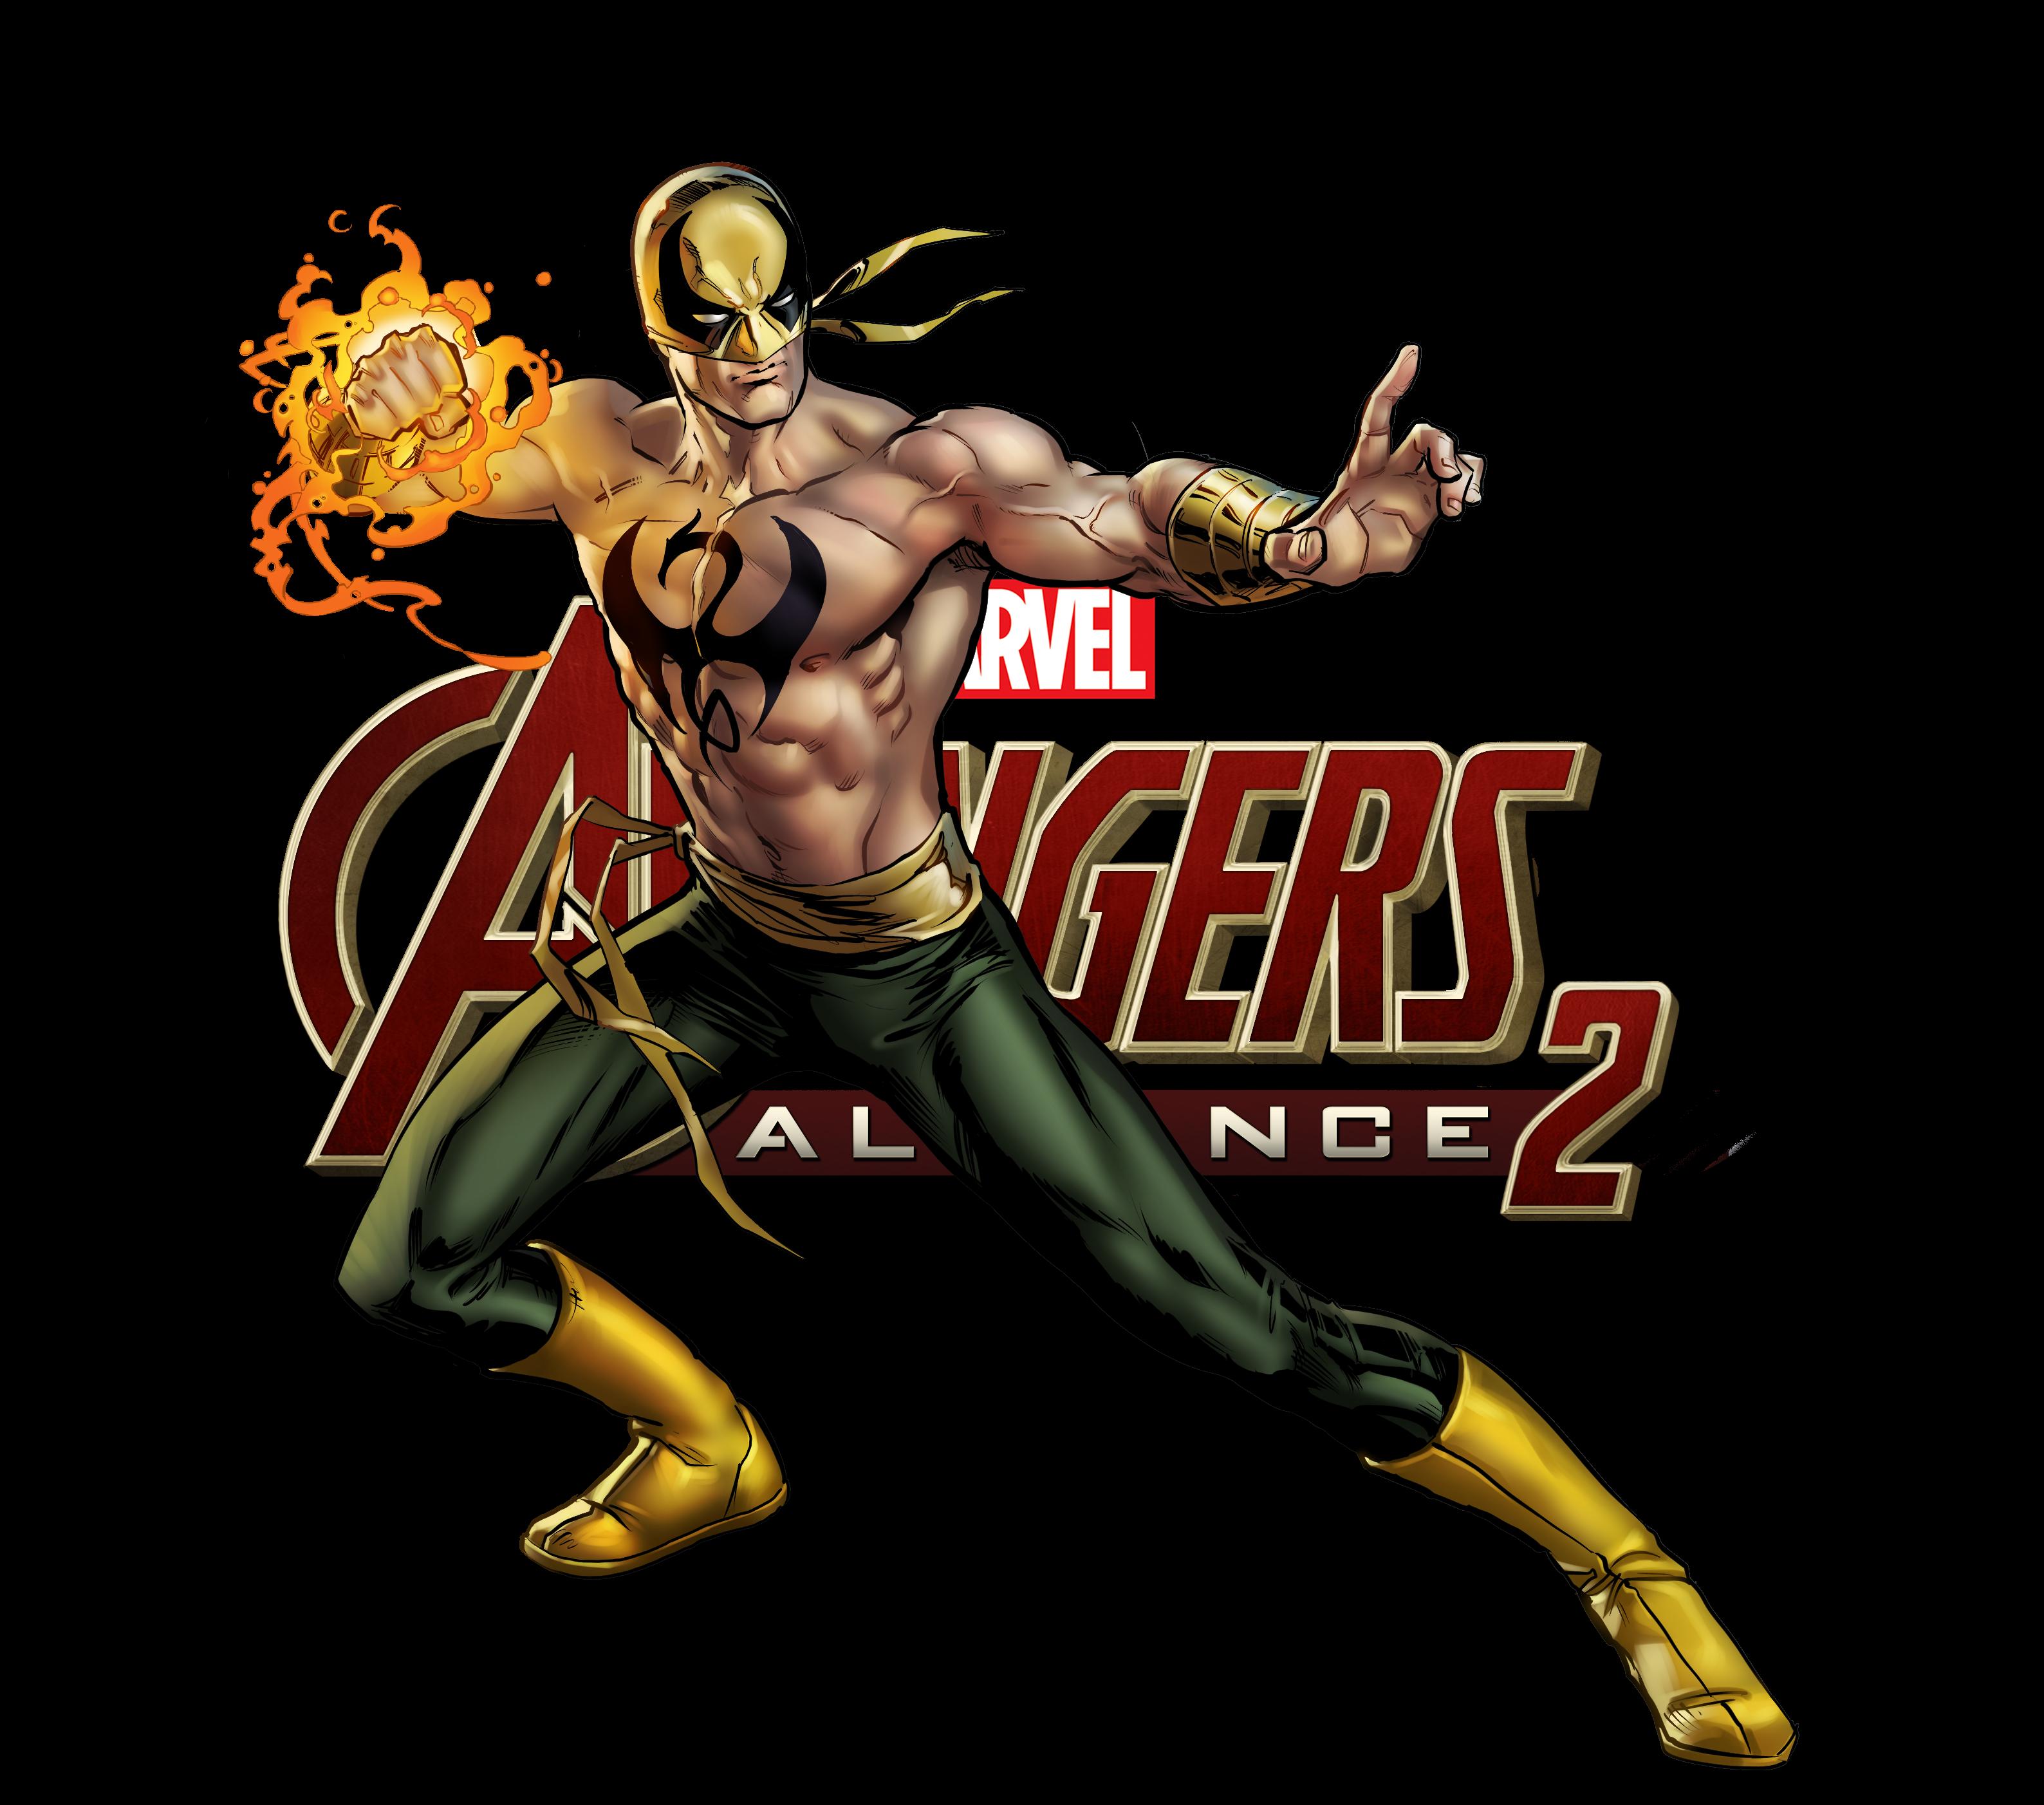 Maa2 Iron Fist 01 Logo Png 3176 2804 Iron Fist Marvel Characters Fist